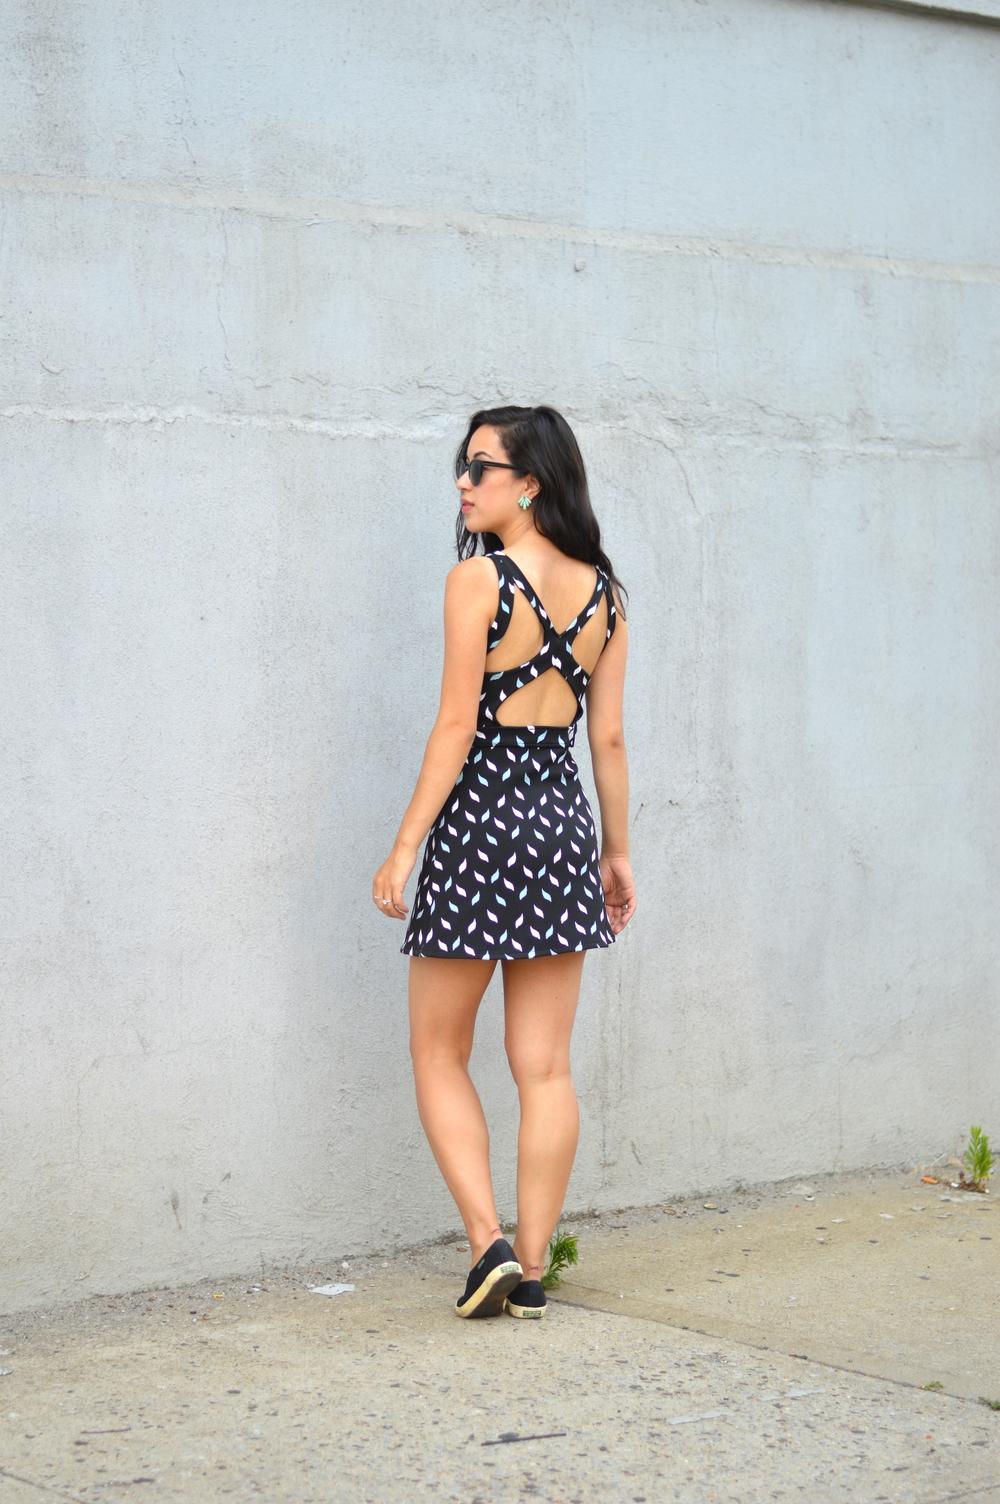 thrifty blogger